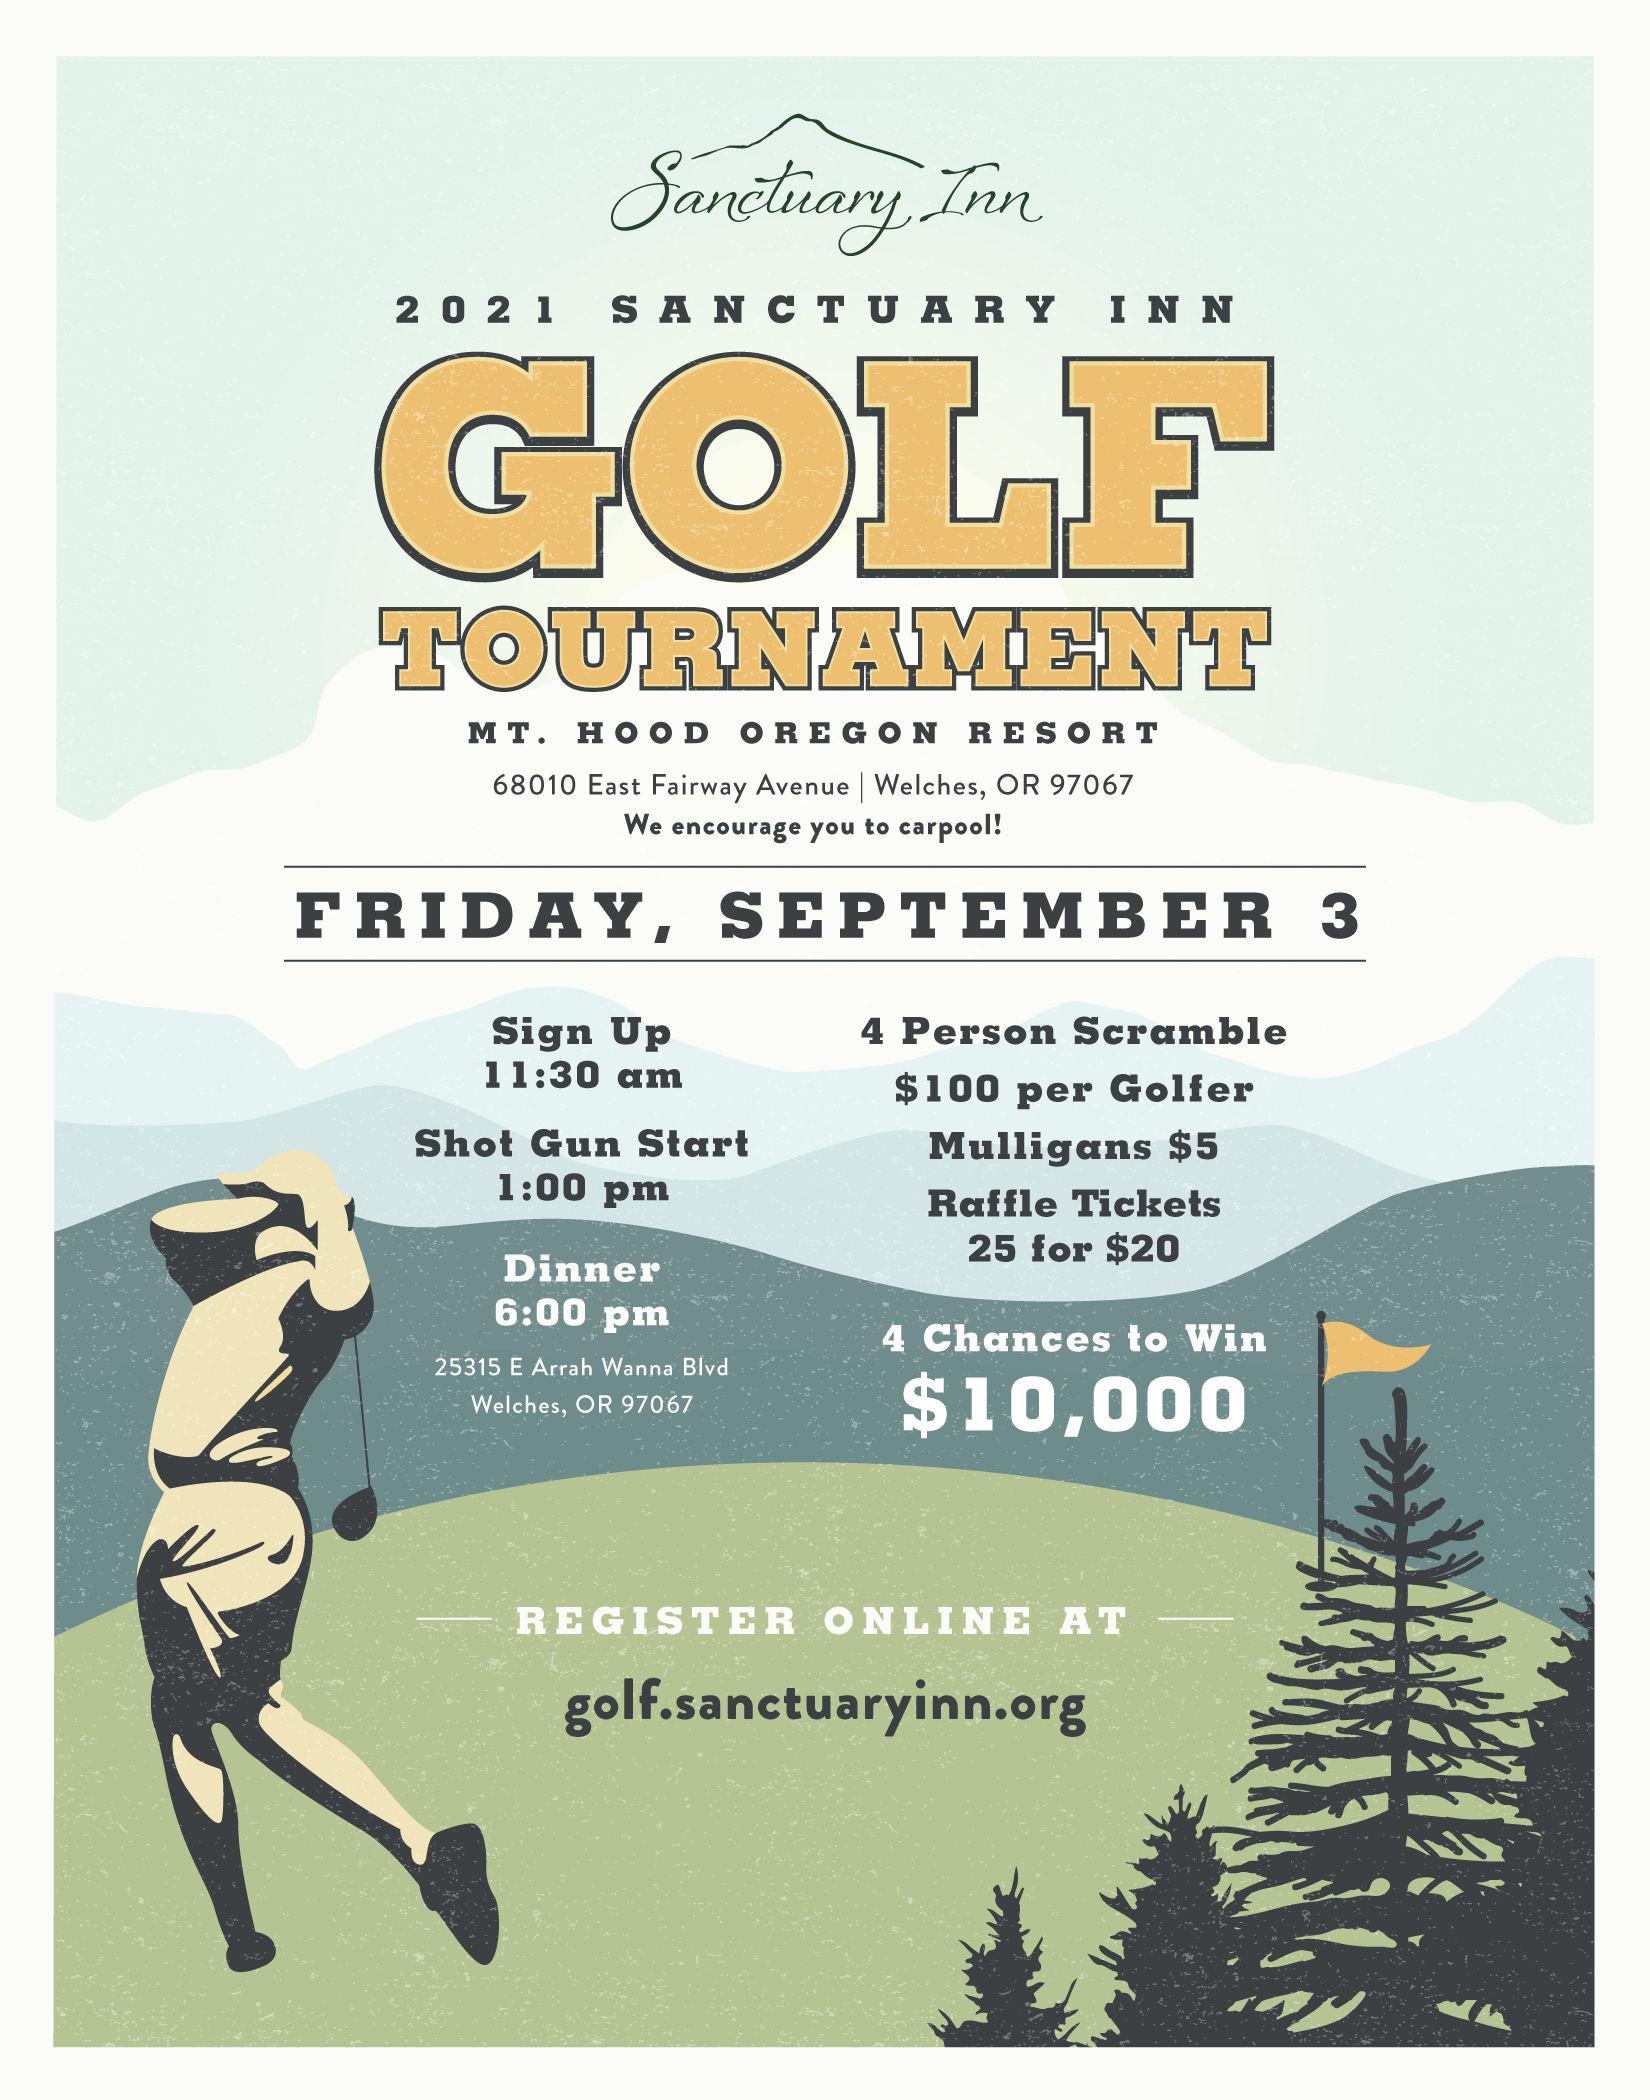 2021 Sanctuary Inn Golf Tournament